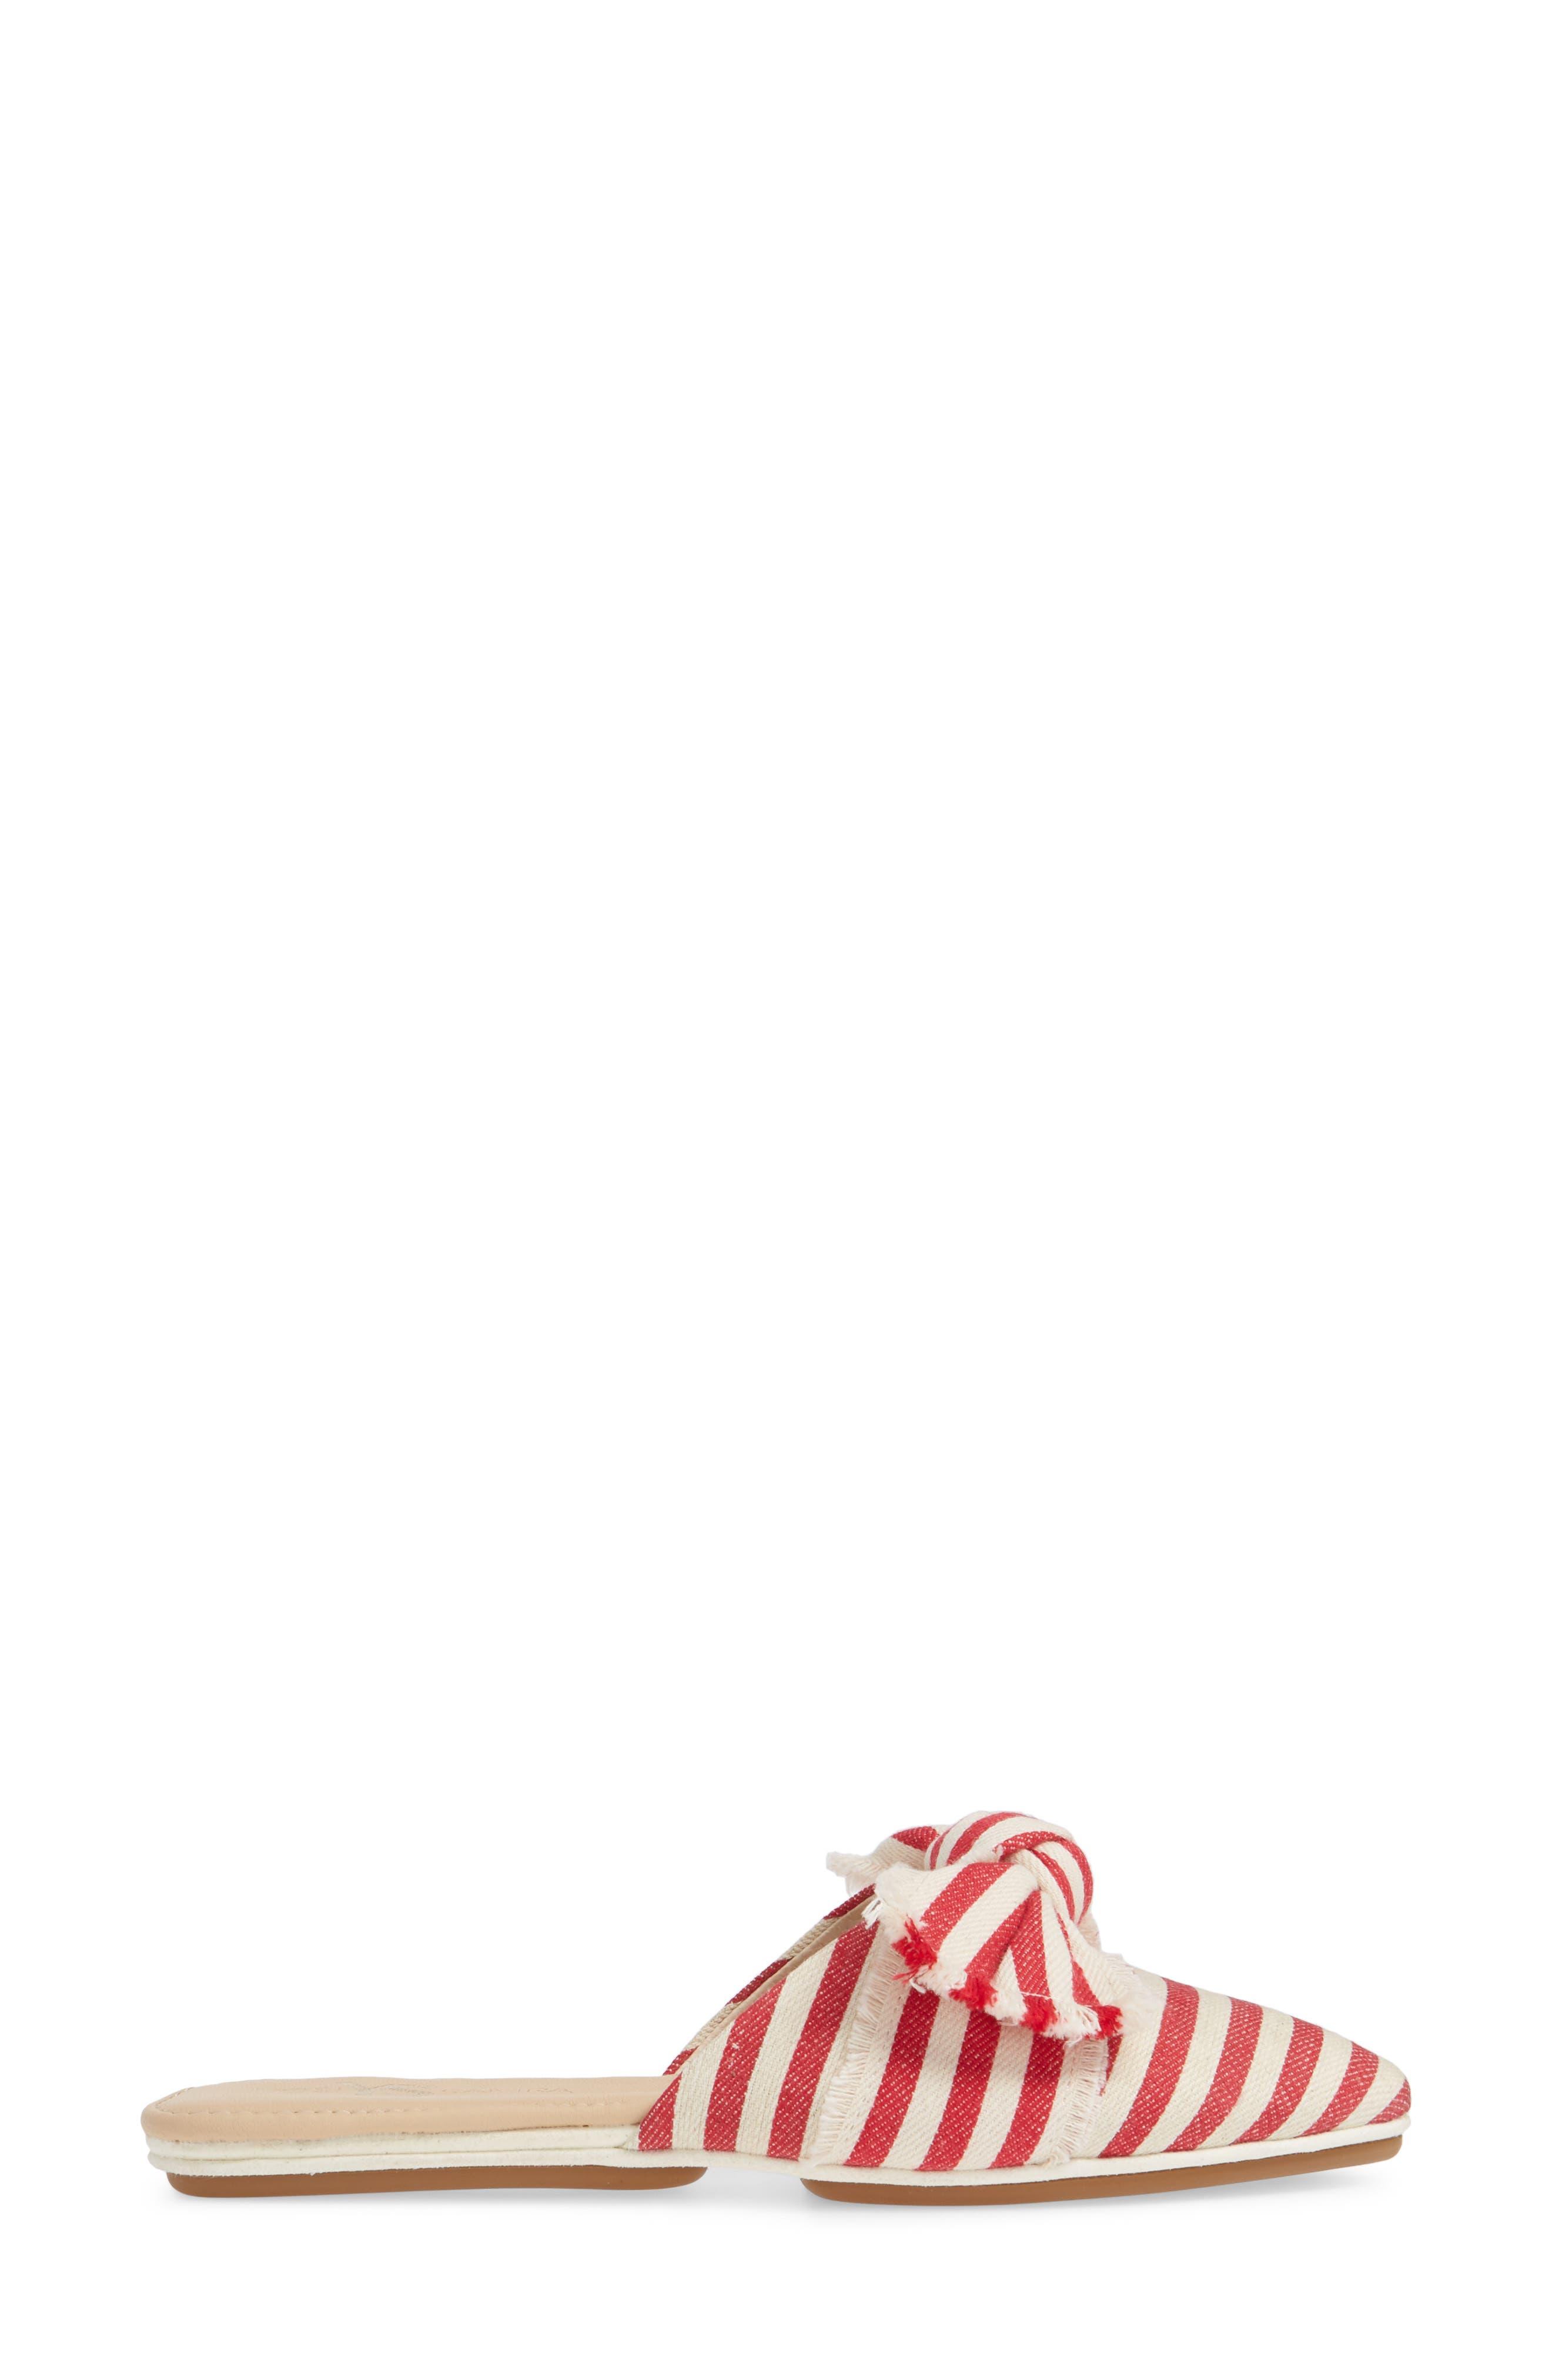 YOSI SAMRA,                             Viceroy Mule,                             Alternate thumbnail 3, color,                             RED / NATURAL WOVEN STRIPE